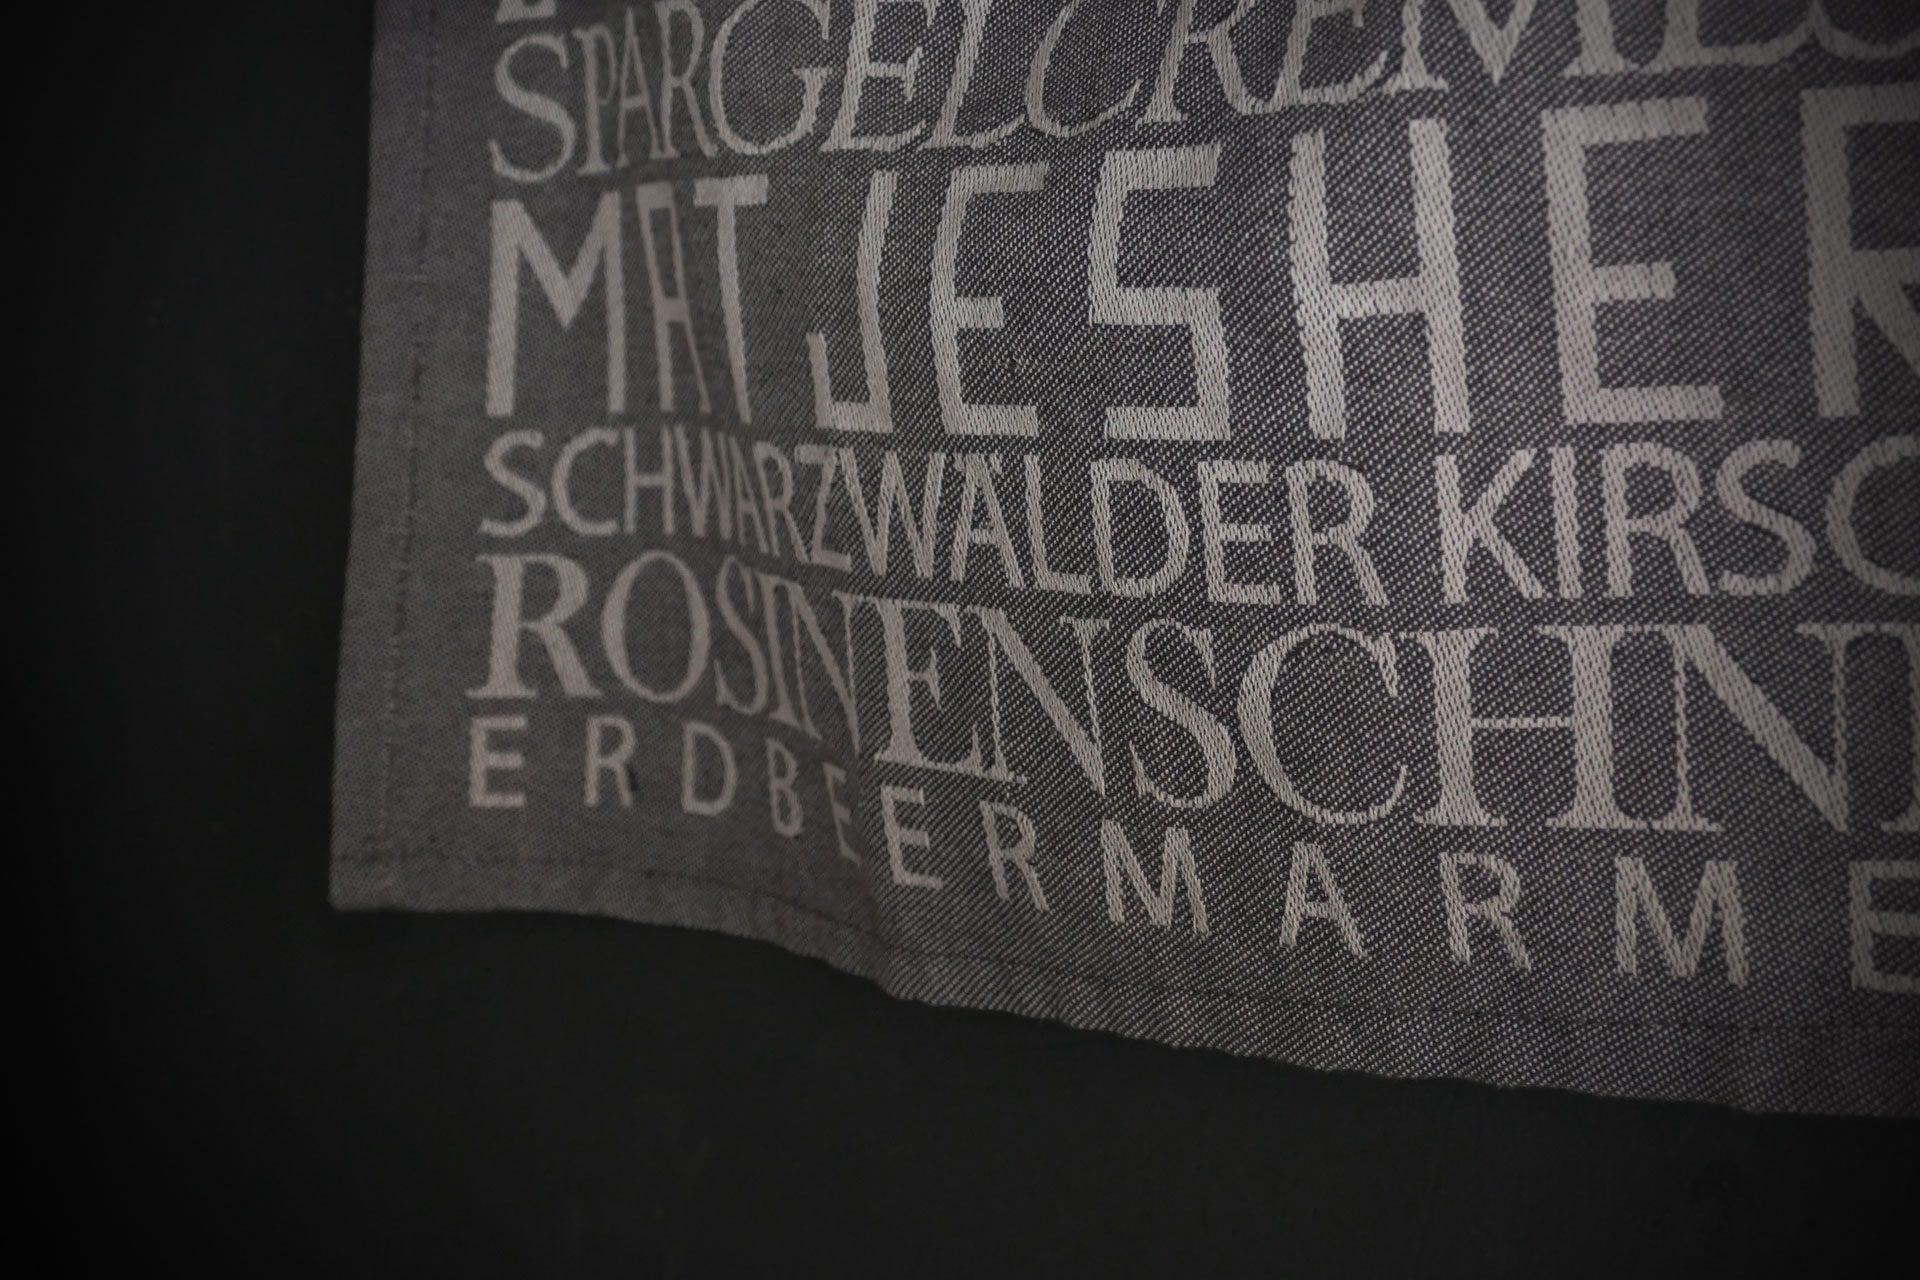 Casa Mia Wald-Michelbach Kulinarisches